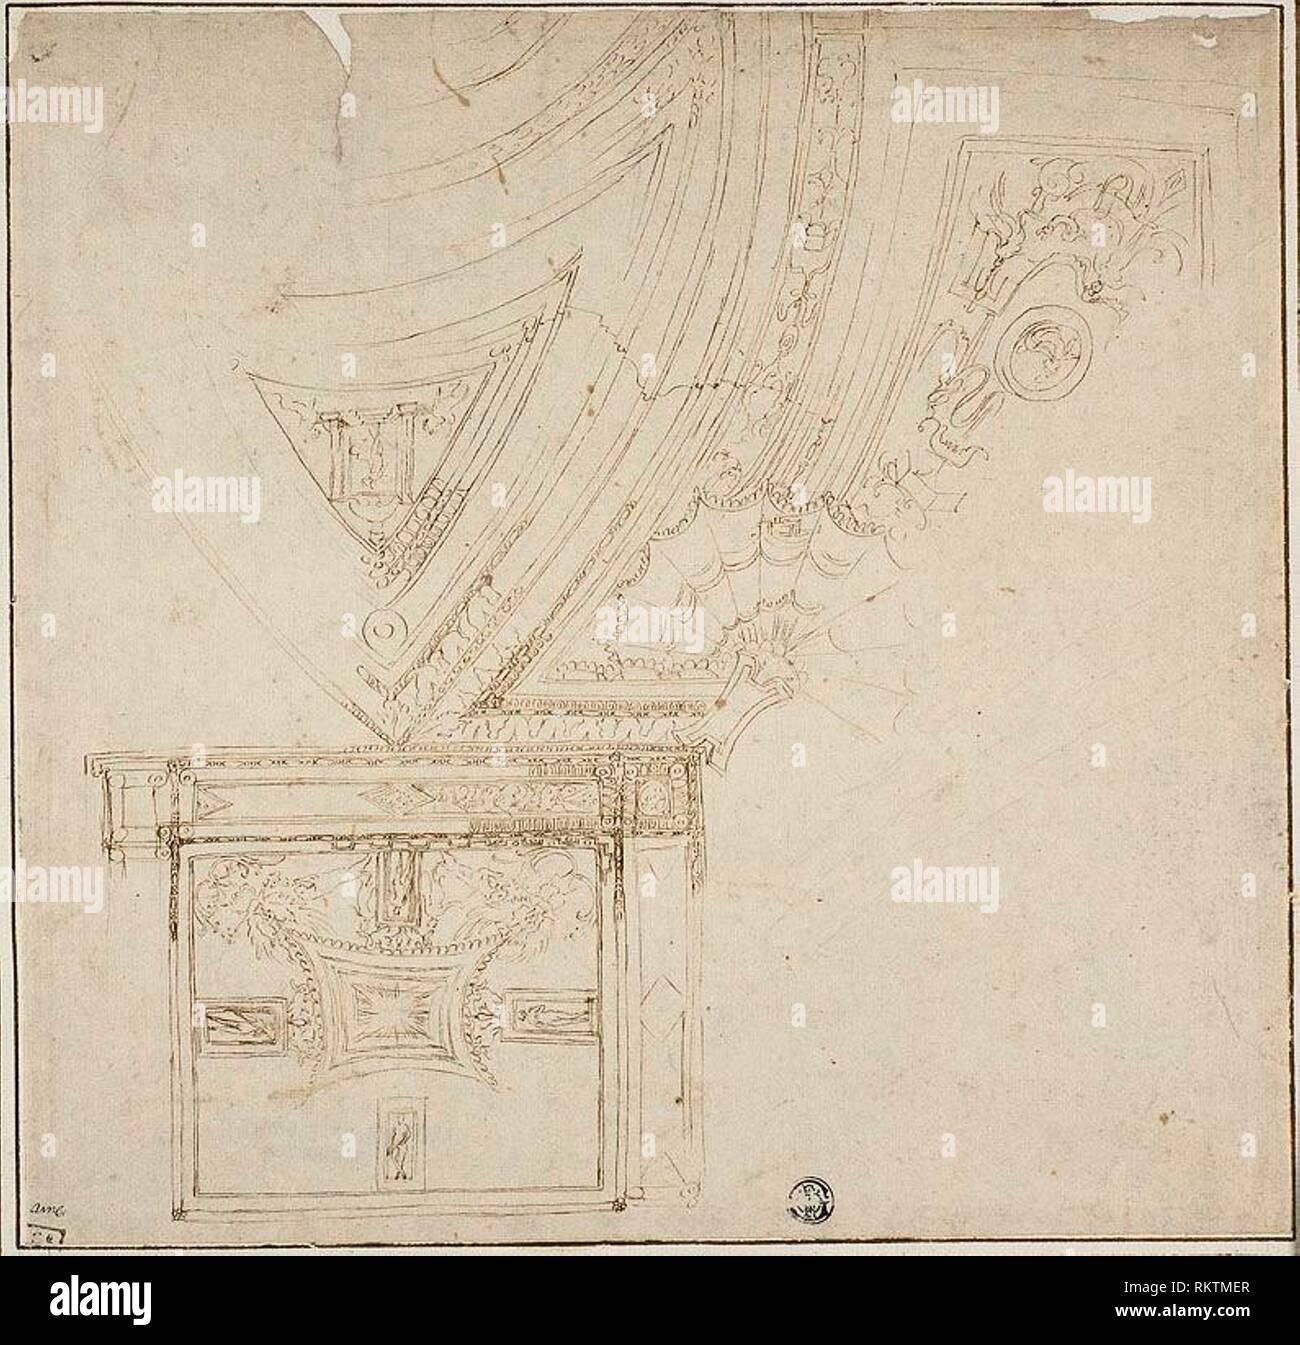 Ceiling Decoration with Grotesques - 1530s - Perino del Vaga, or circle of Italian, 1500/01-1547 - Origin: Italy, Date: 1530-1539, Medium: Pen and - Stock Image